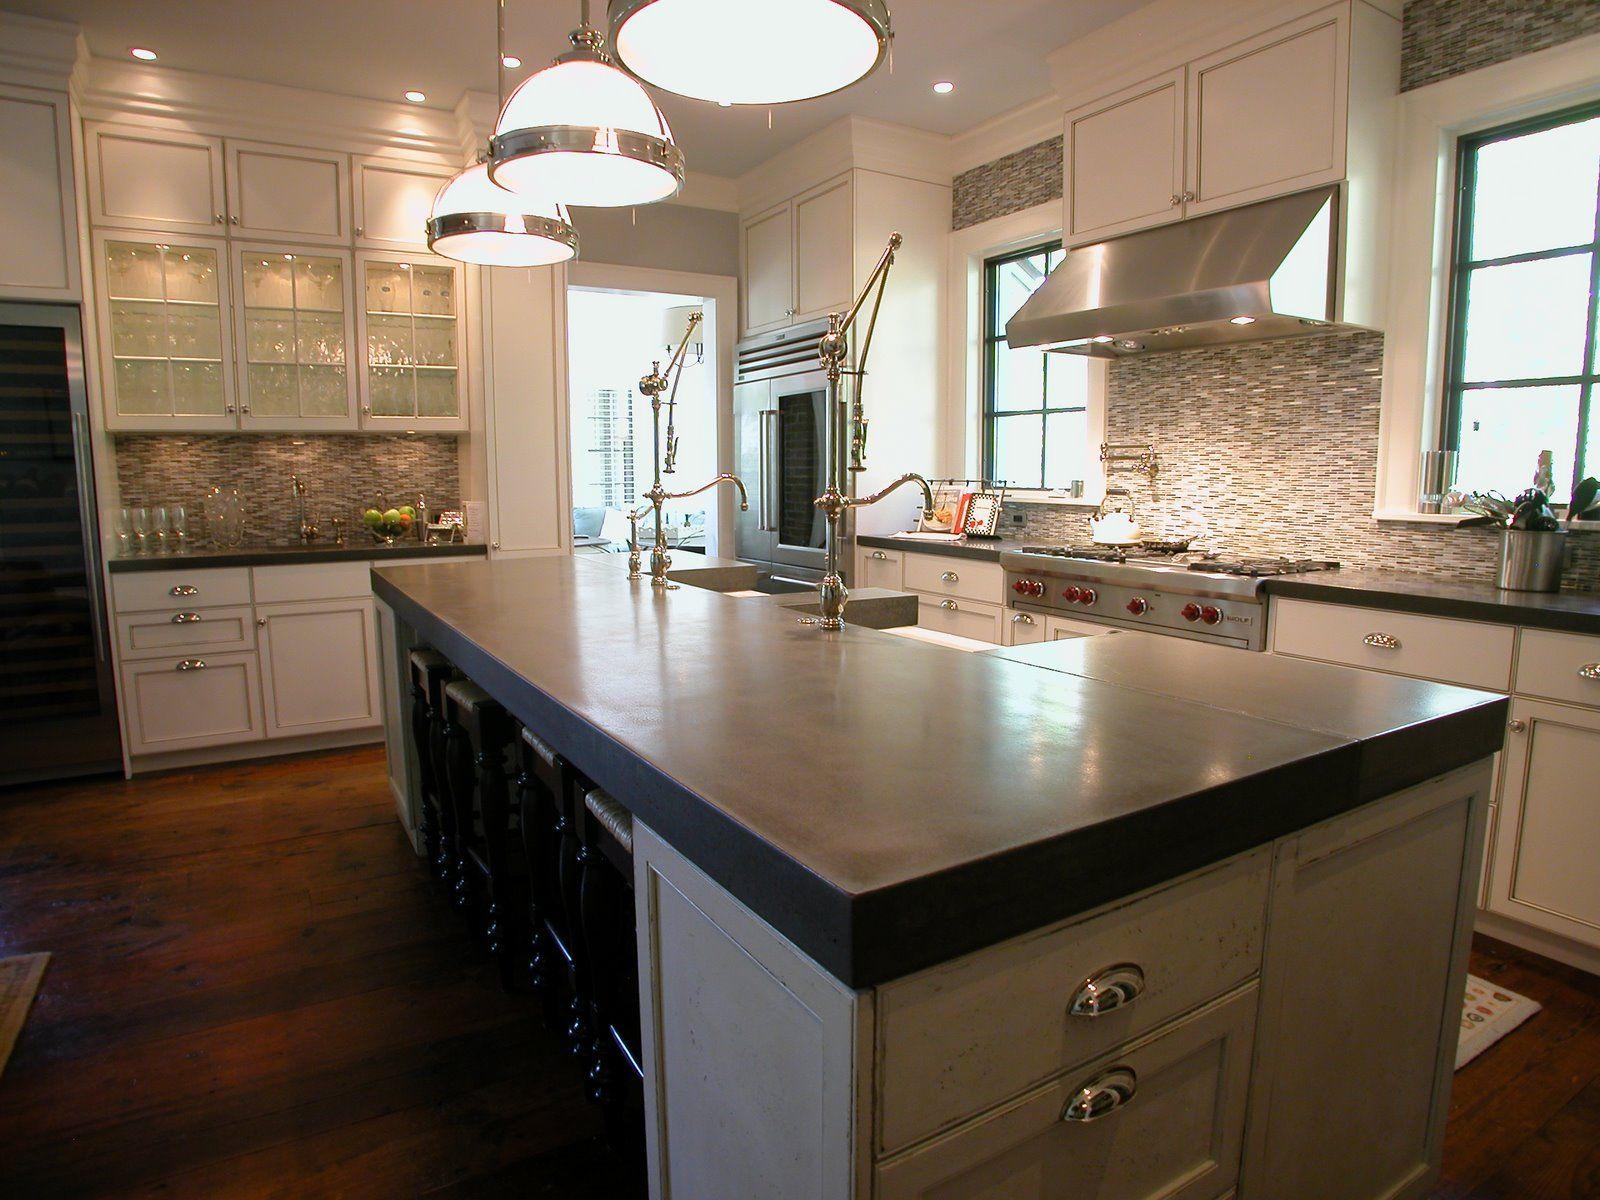 Kitchen Countertops Installation Cost: Concrete Countertops Do It Yourself